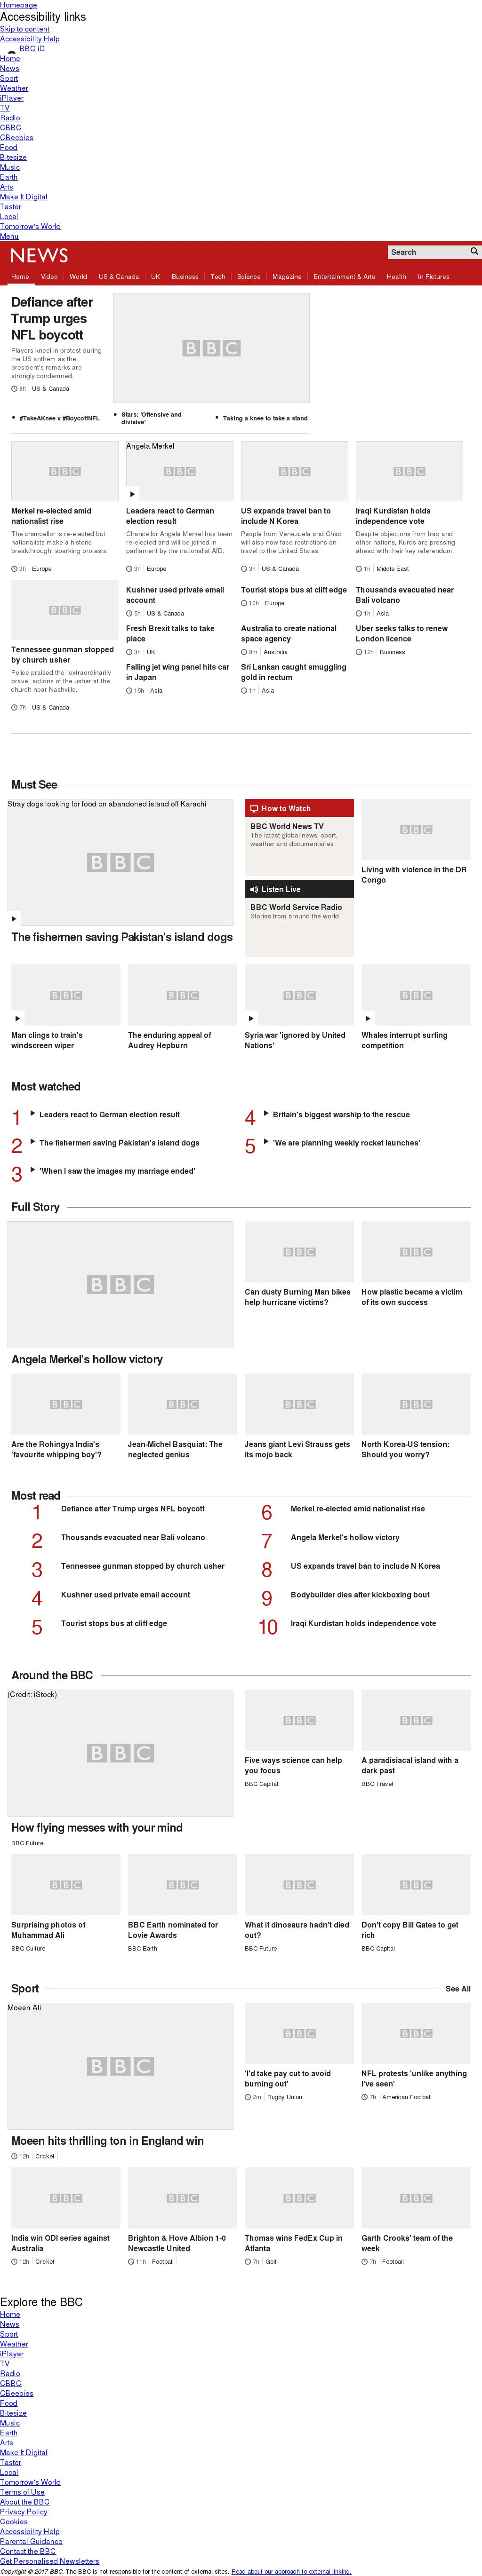 BBC at Monday Sept. 25, 2017, 6 a.m. UTC